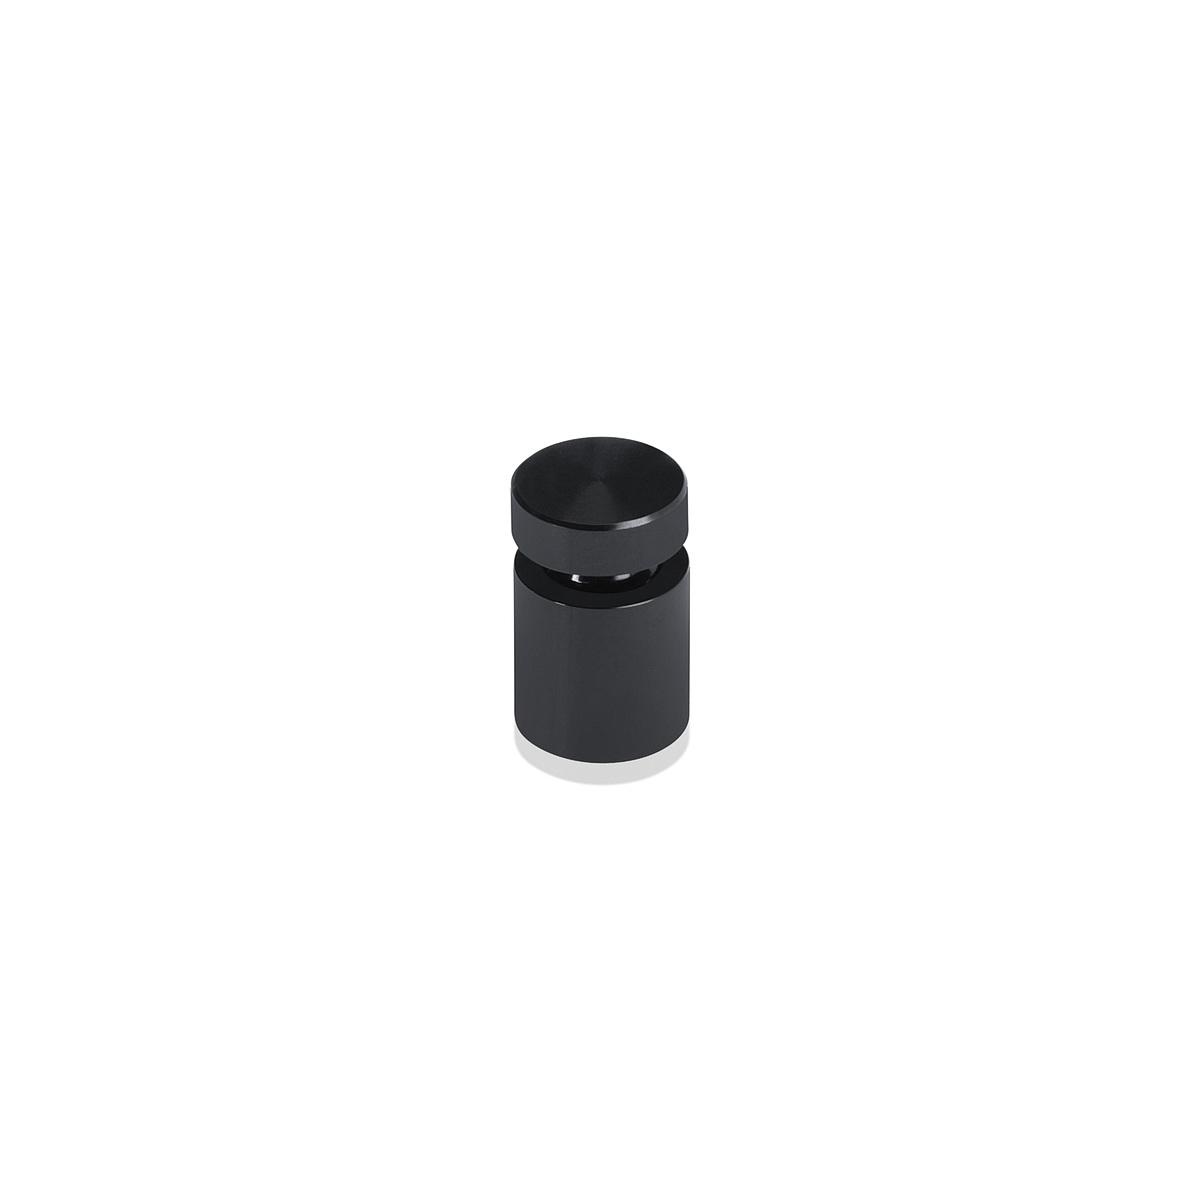 1/2'' Diameter X 1/2'' Barrel Length, Affordable Aluminum Standoffs, Black Anodized Finish Easy Fasten Standoff (For Inside / Outside use)